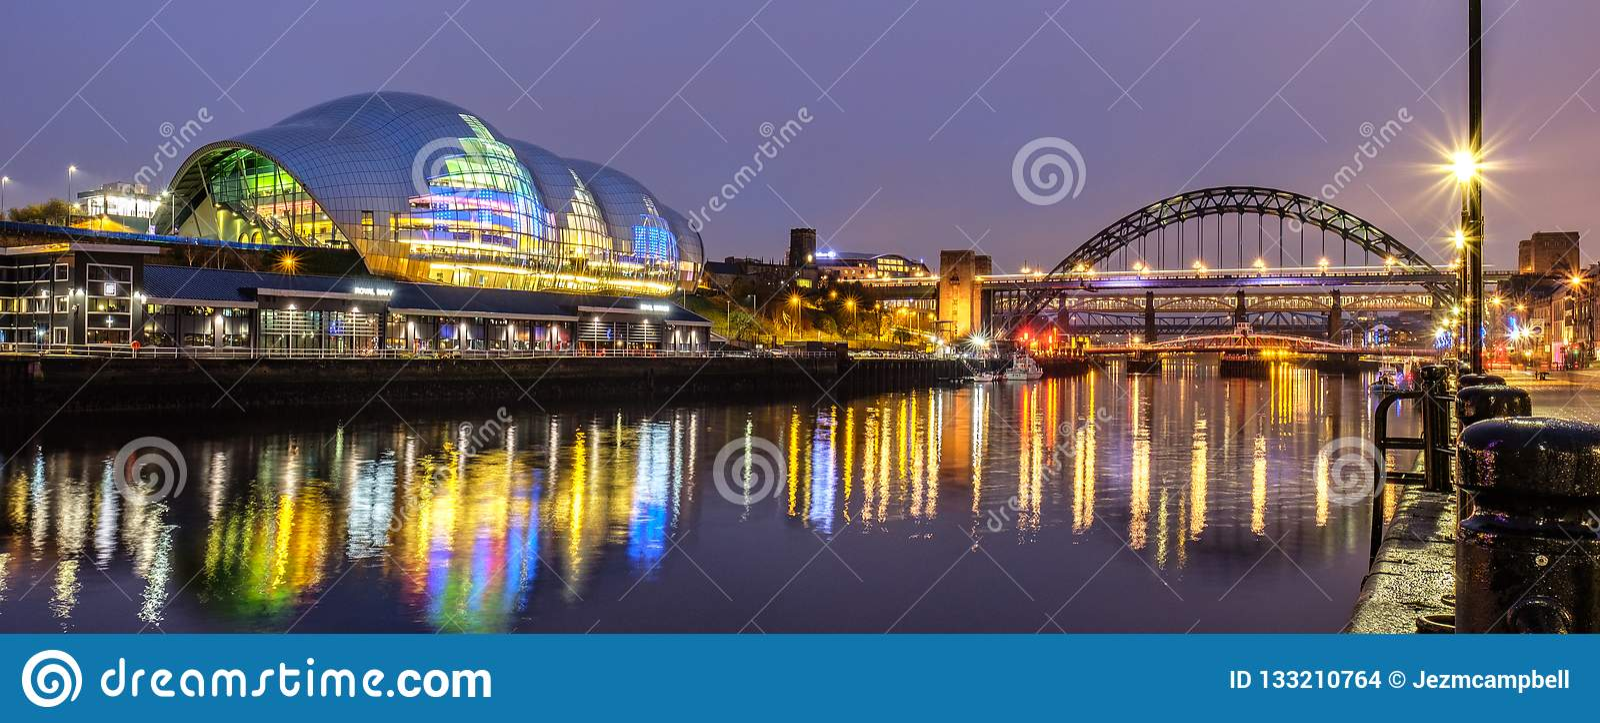 Sage Gateshead och Tyne Bridge